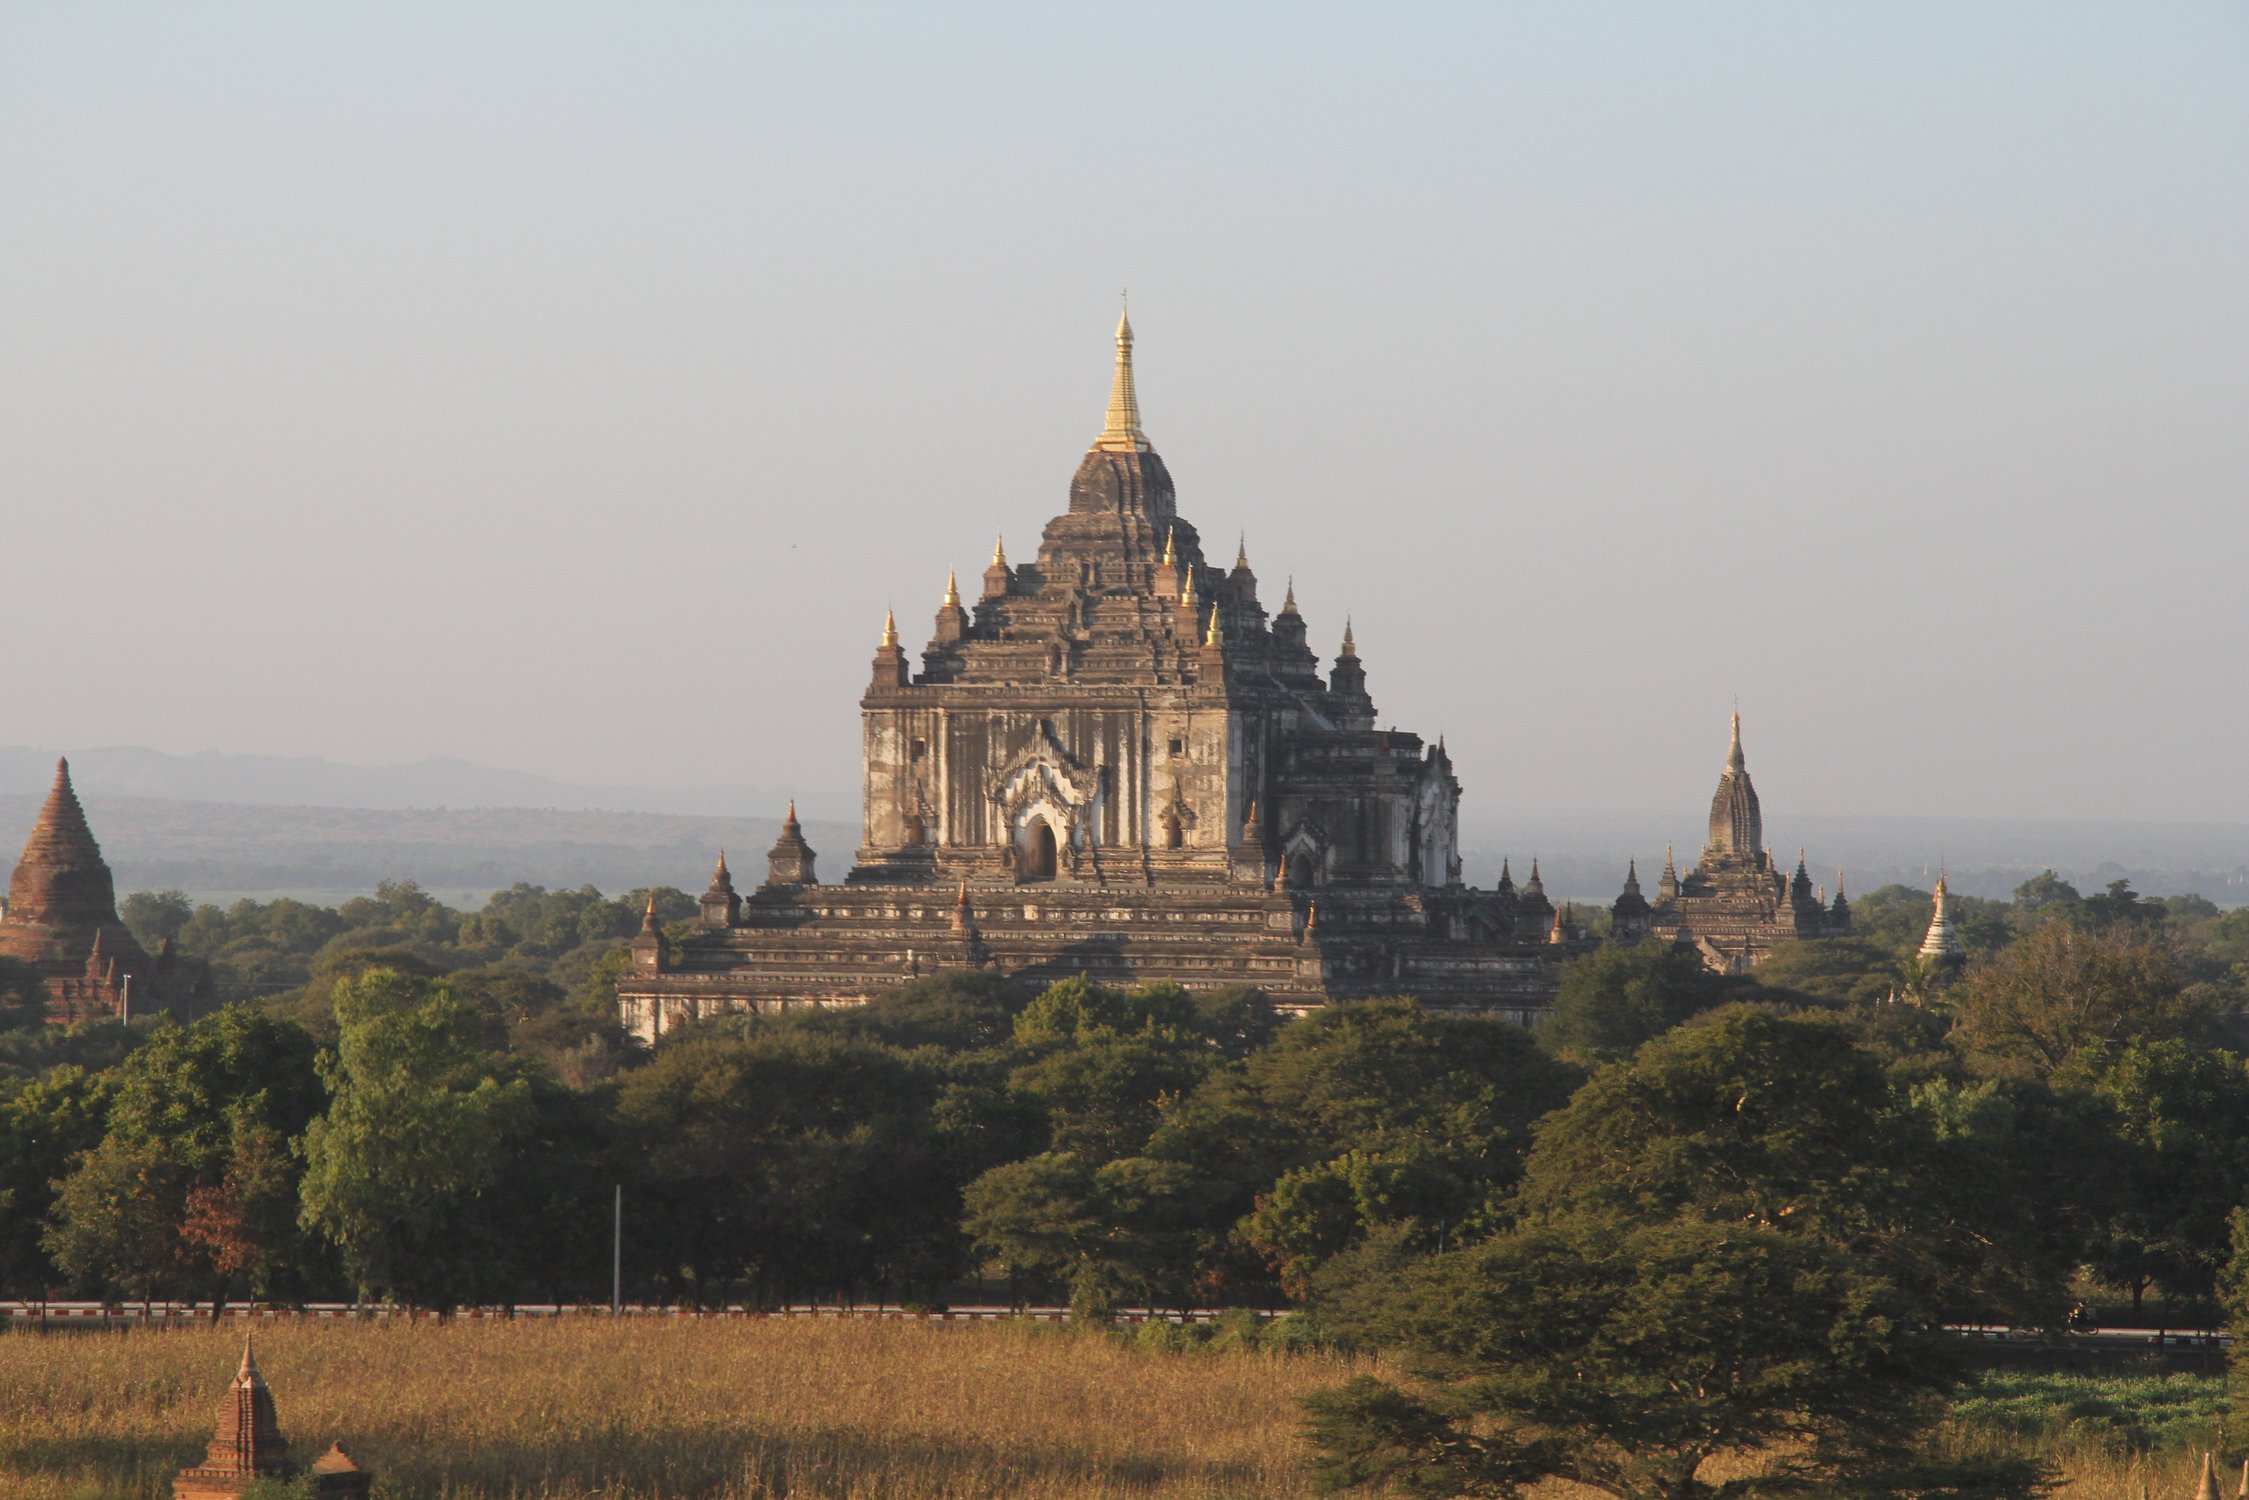 Храм Ананда, 1091 г. Баган, Мьянма